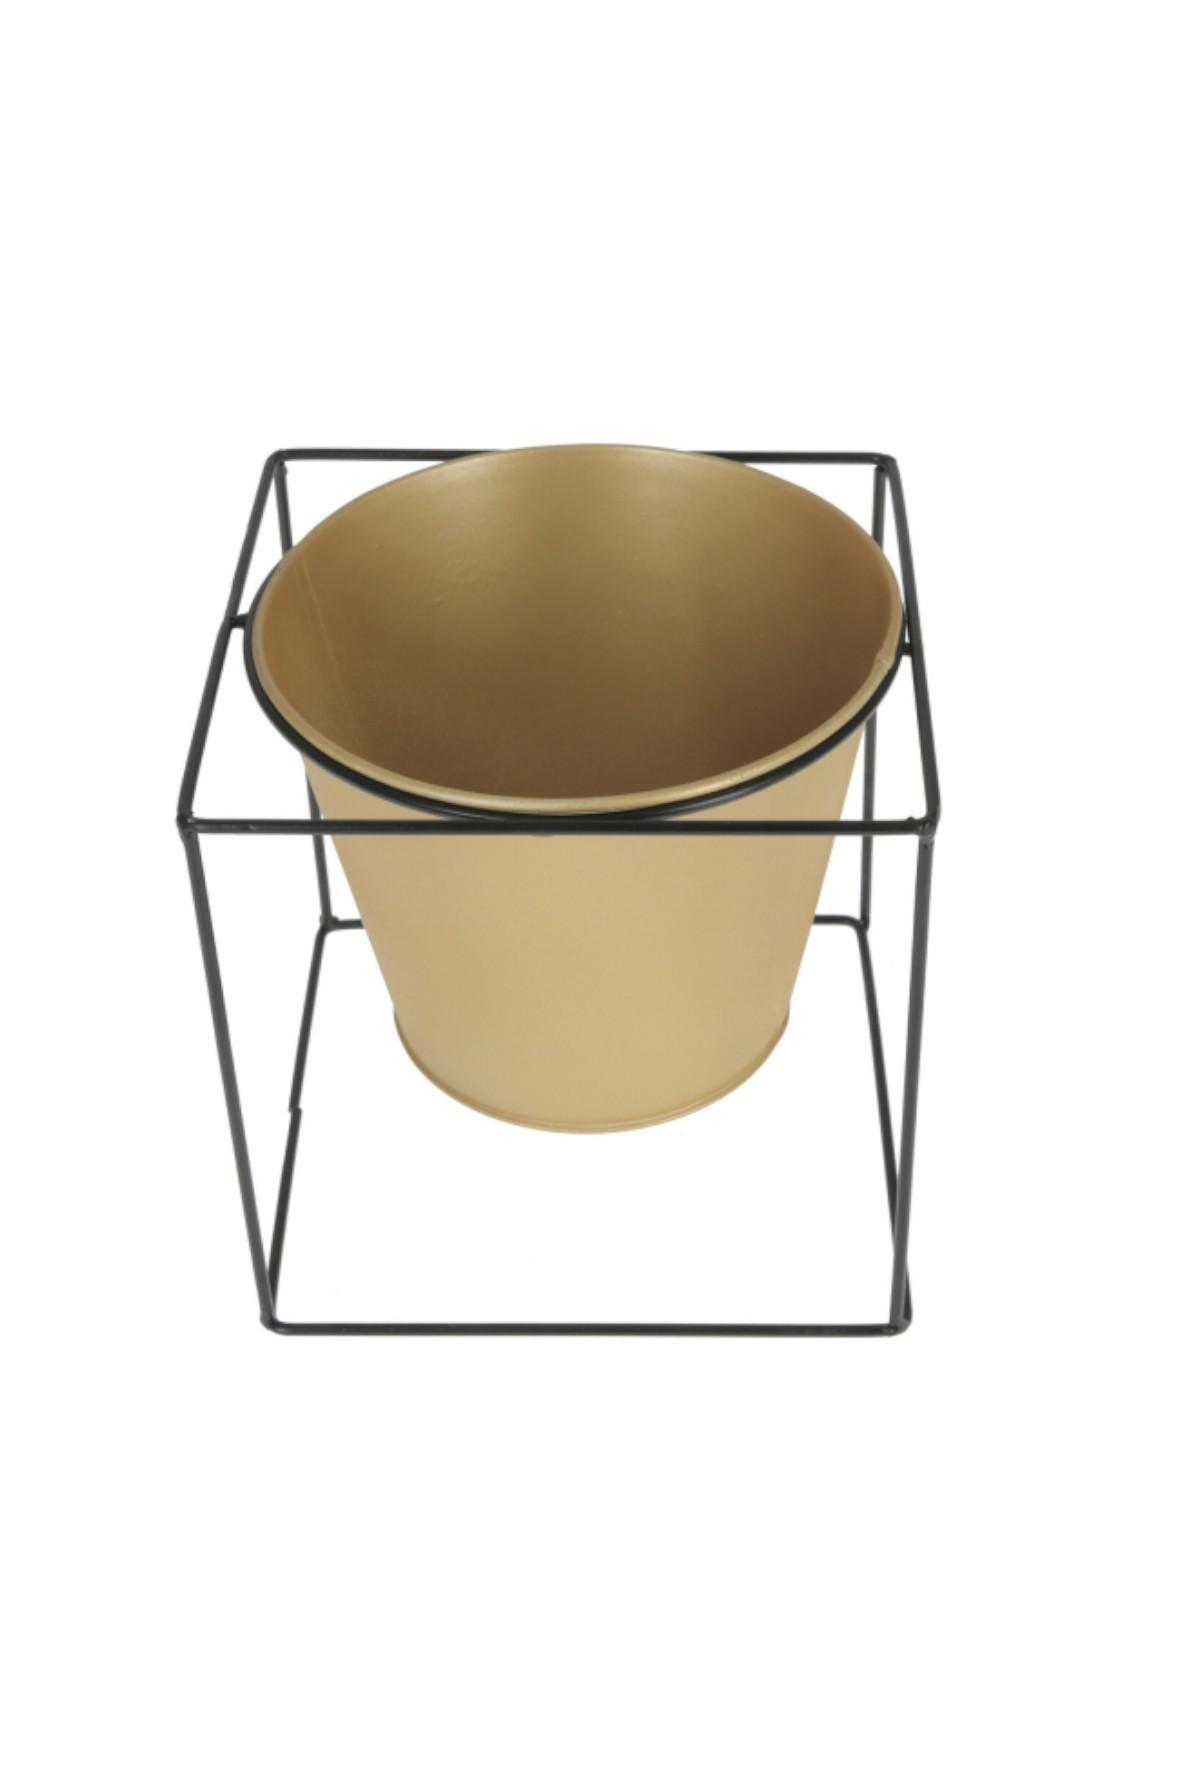 SWEN GOLD Osłonka na stojaku 16x16cm